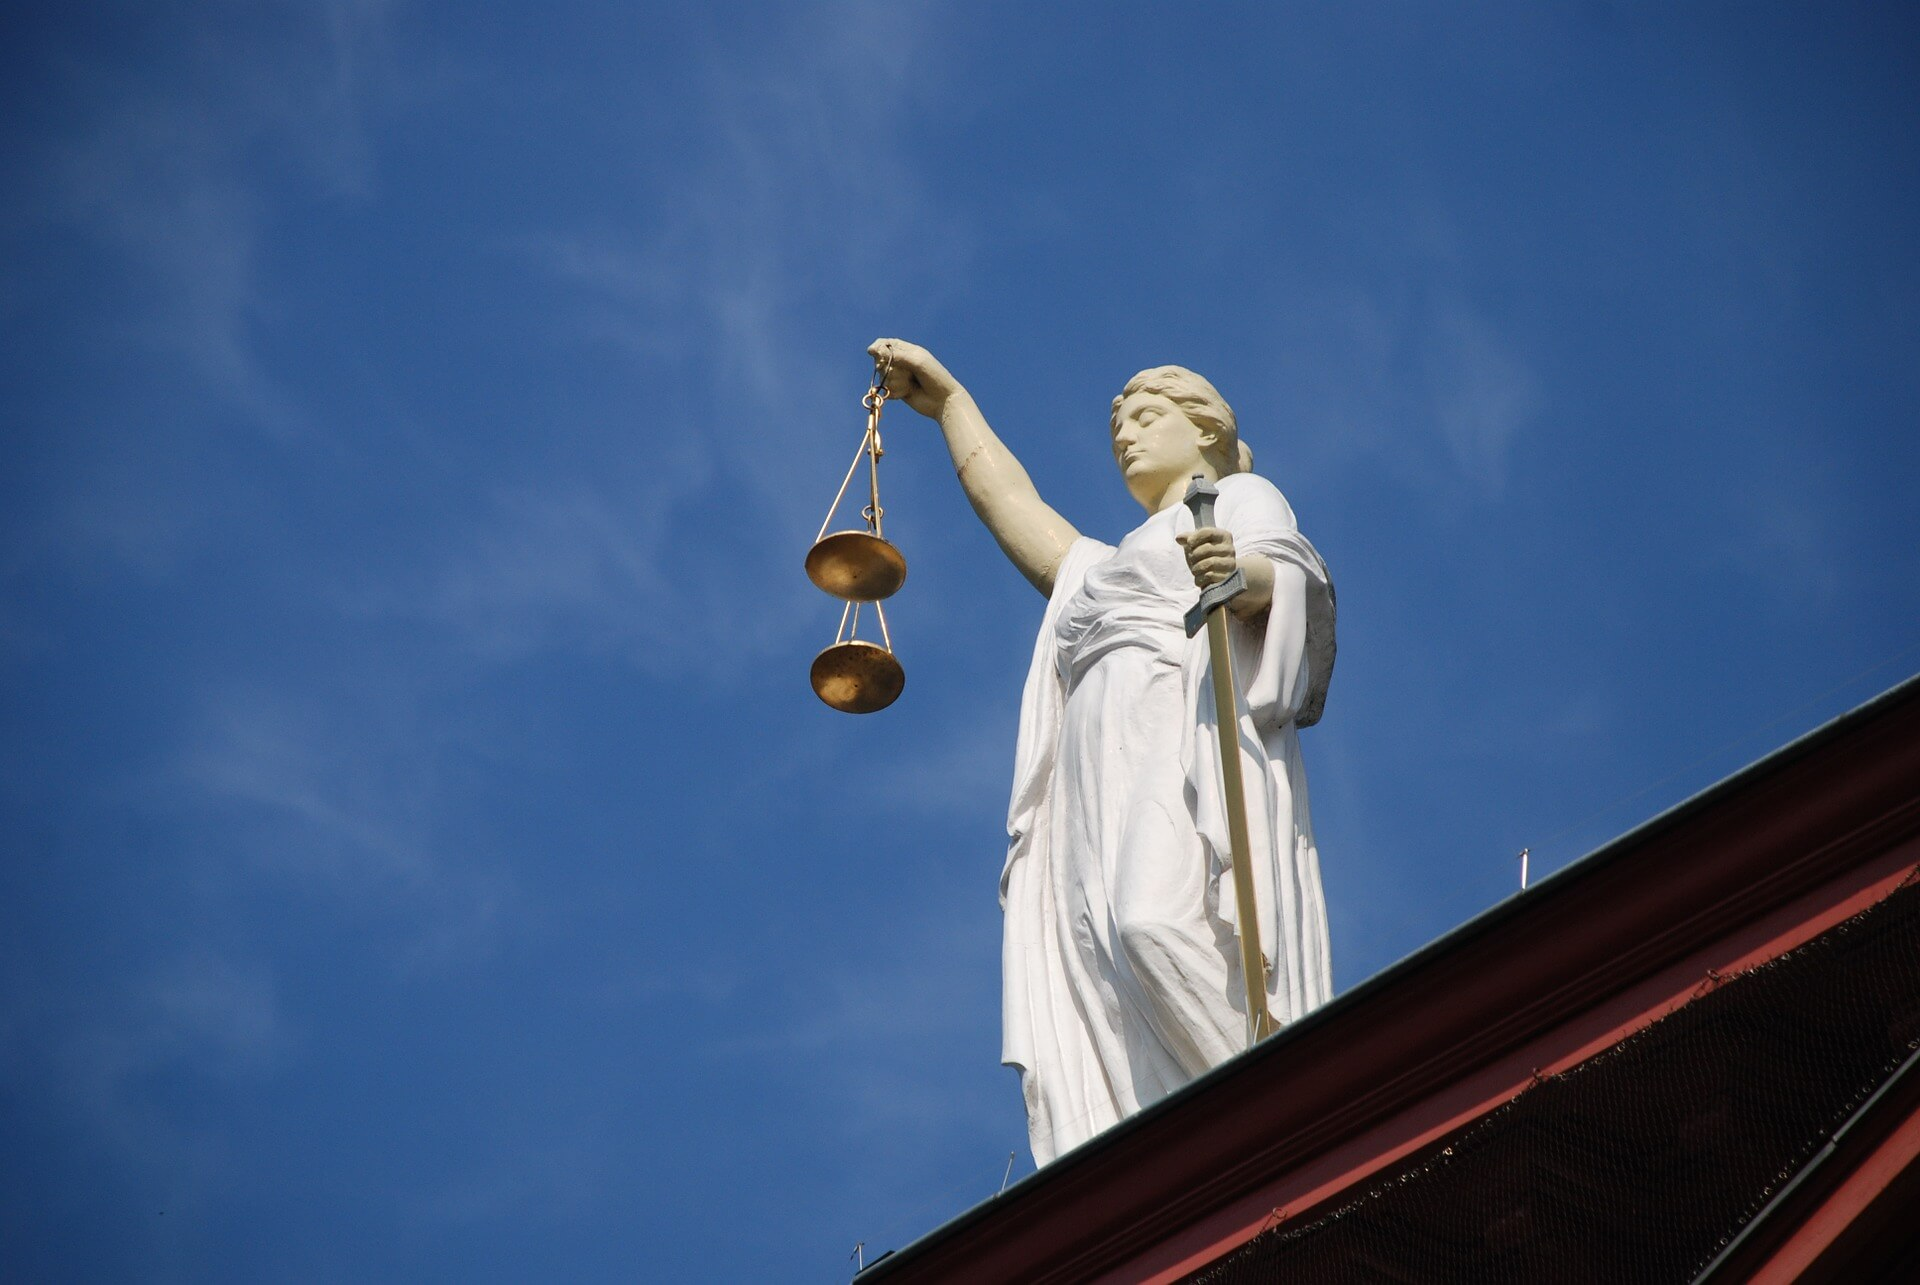 Sąd lustracyjny